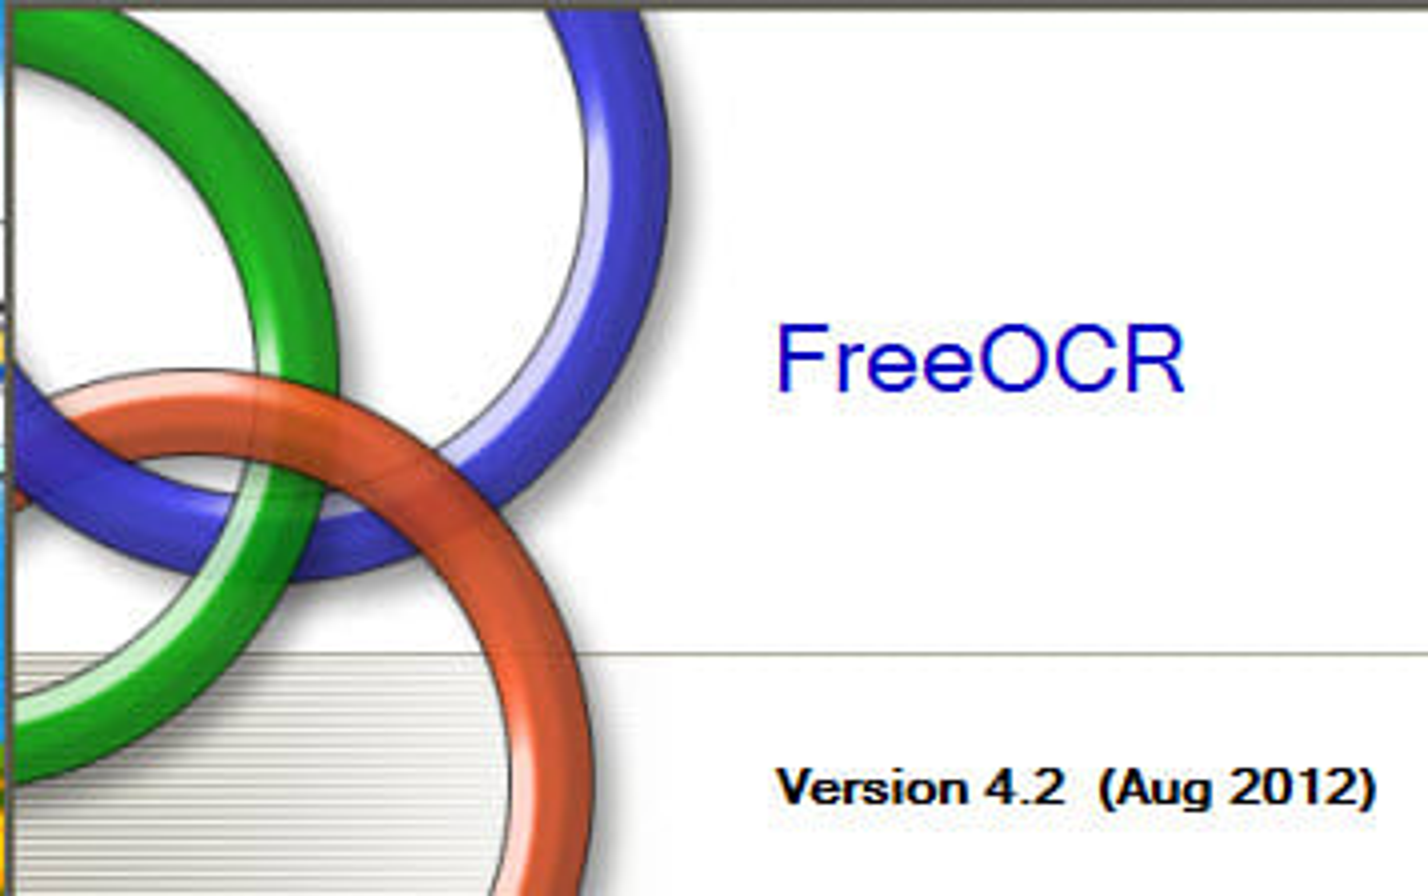 FreeOCR 4.2